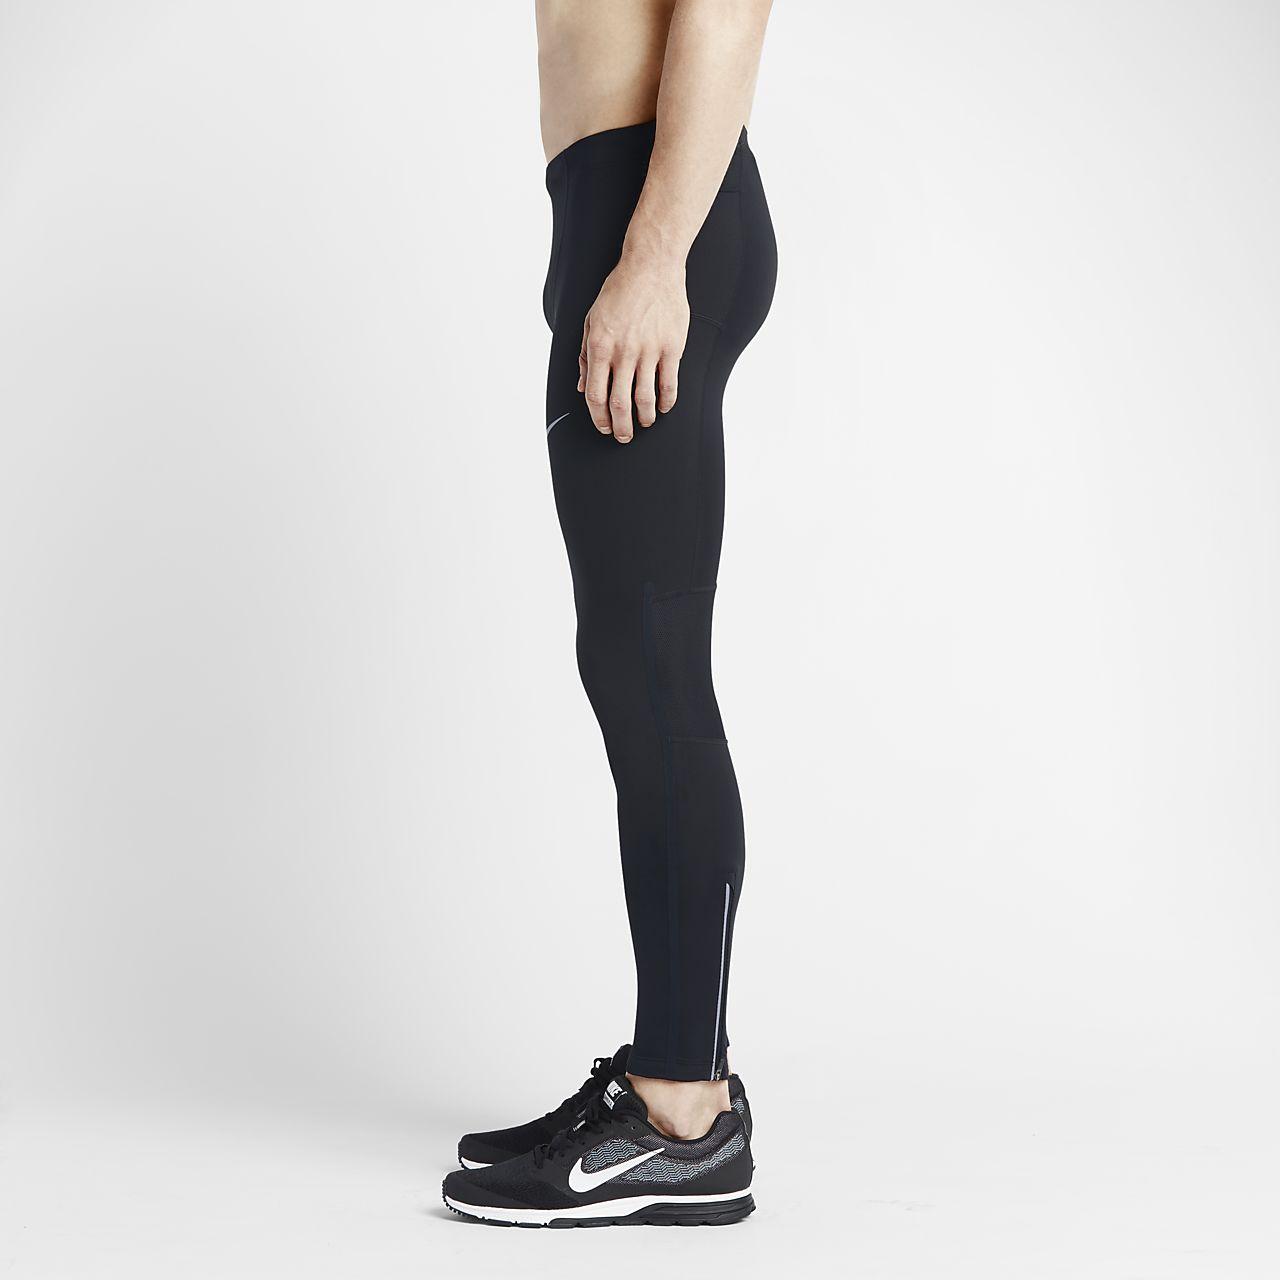 9c526761f1b3 Nike Power Tech Men s Running Tights. Nike.com AU